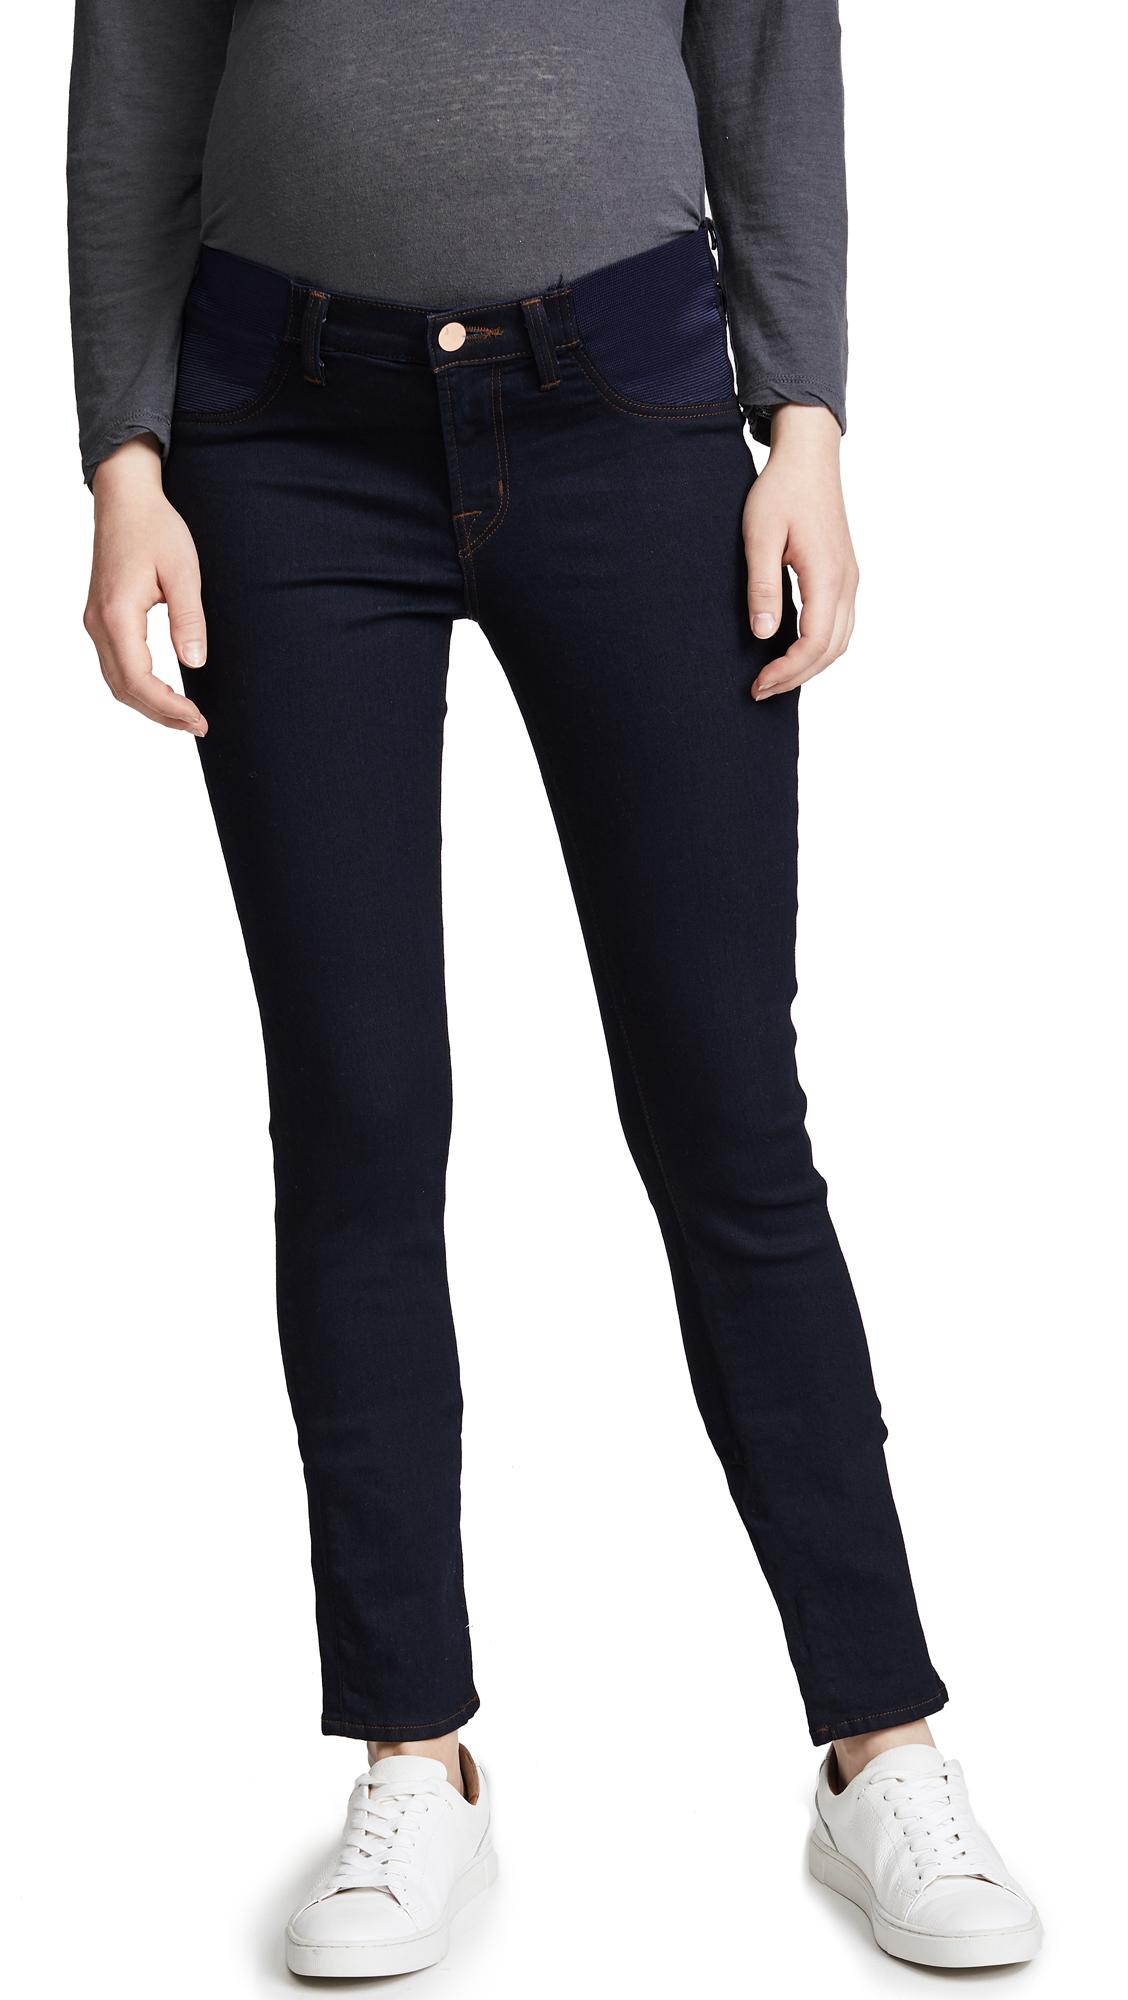 3411 Maternity Skinny Jeans